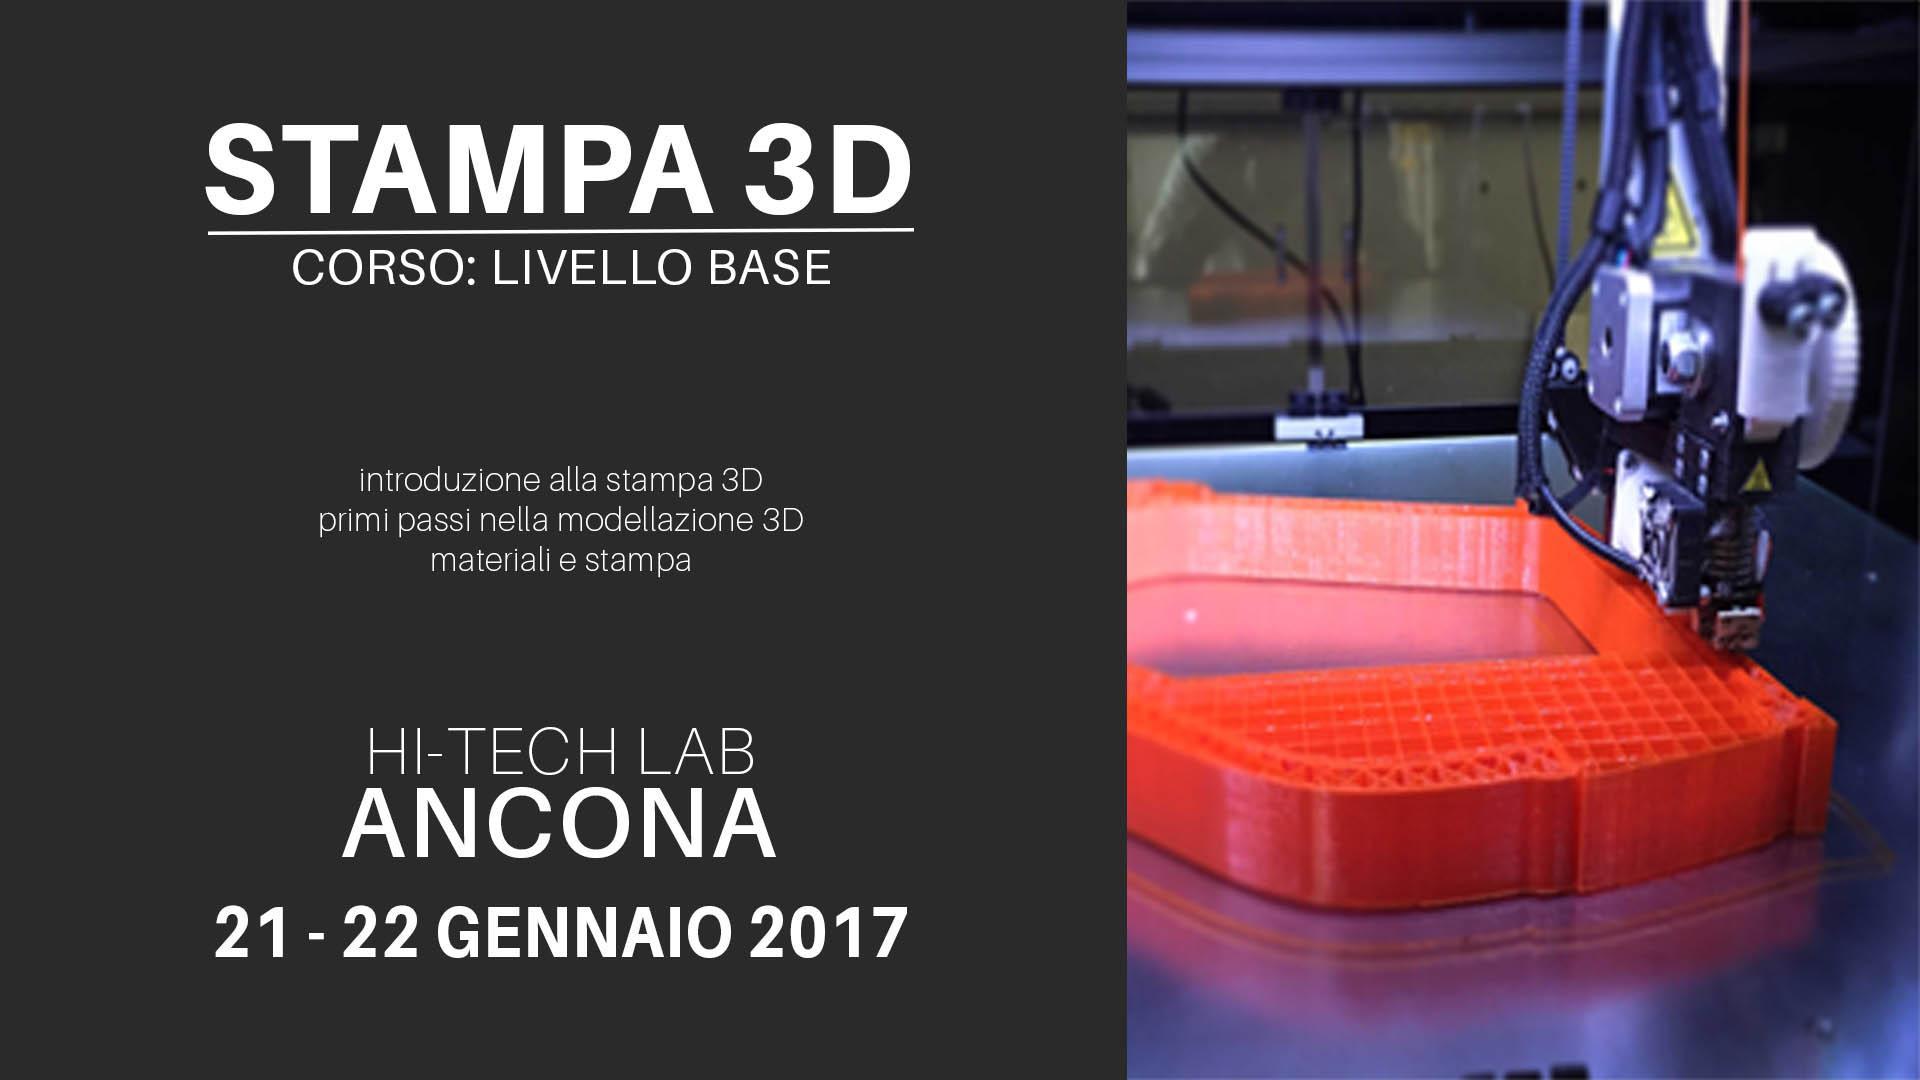 Corso stampa 3D: livello base